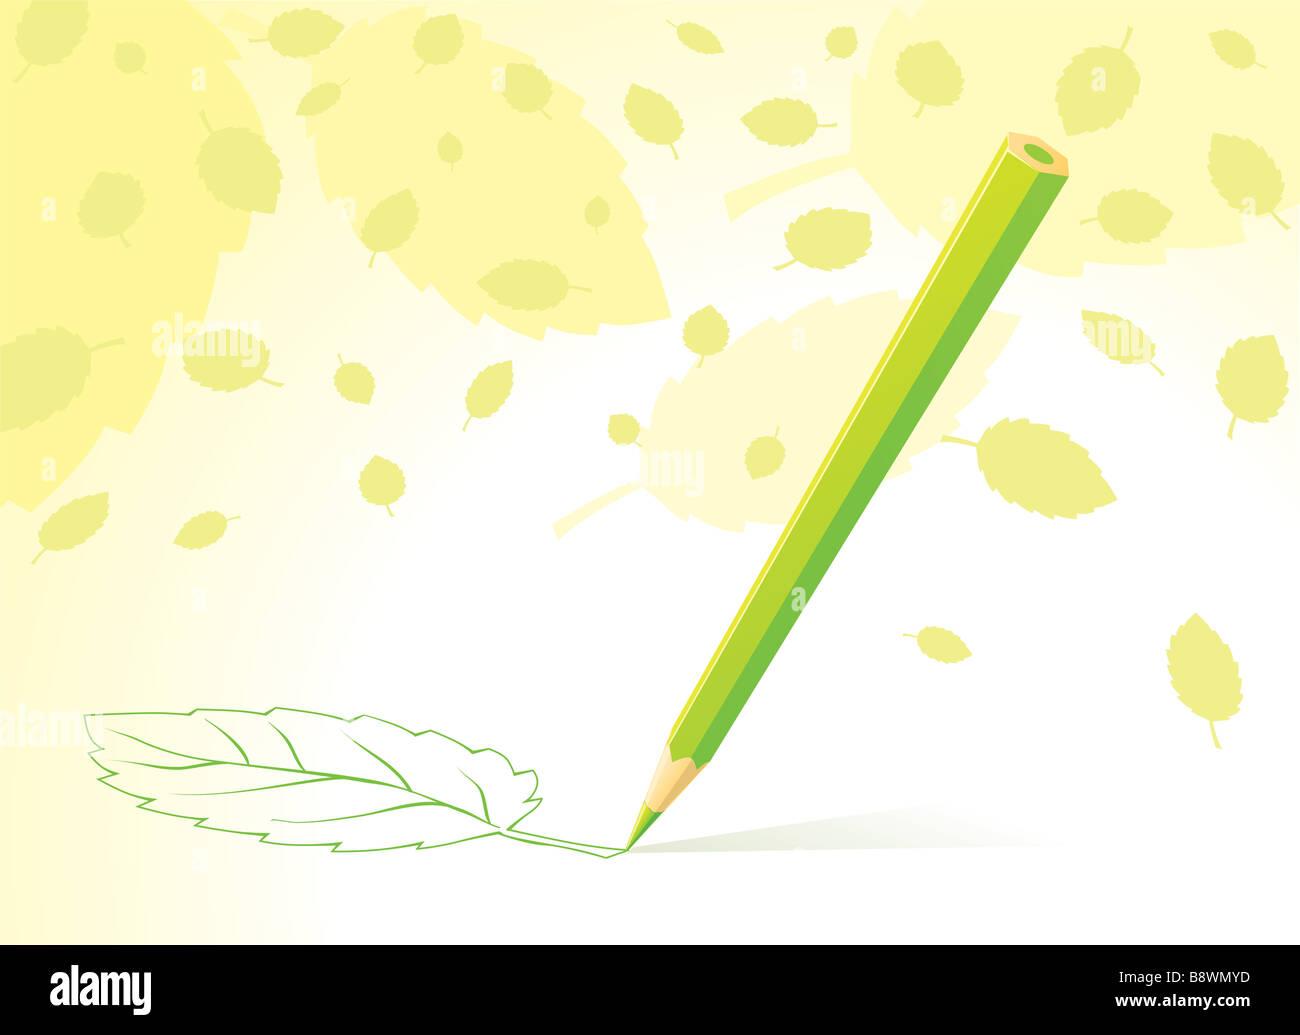 Illustration der Federzeichnung grünes Blatt Stockbild